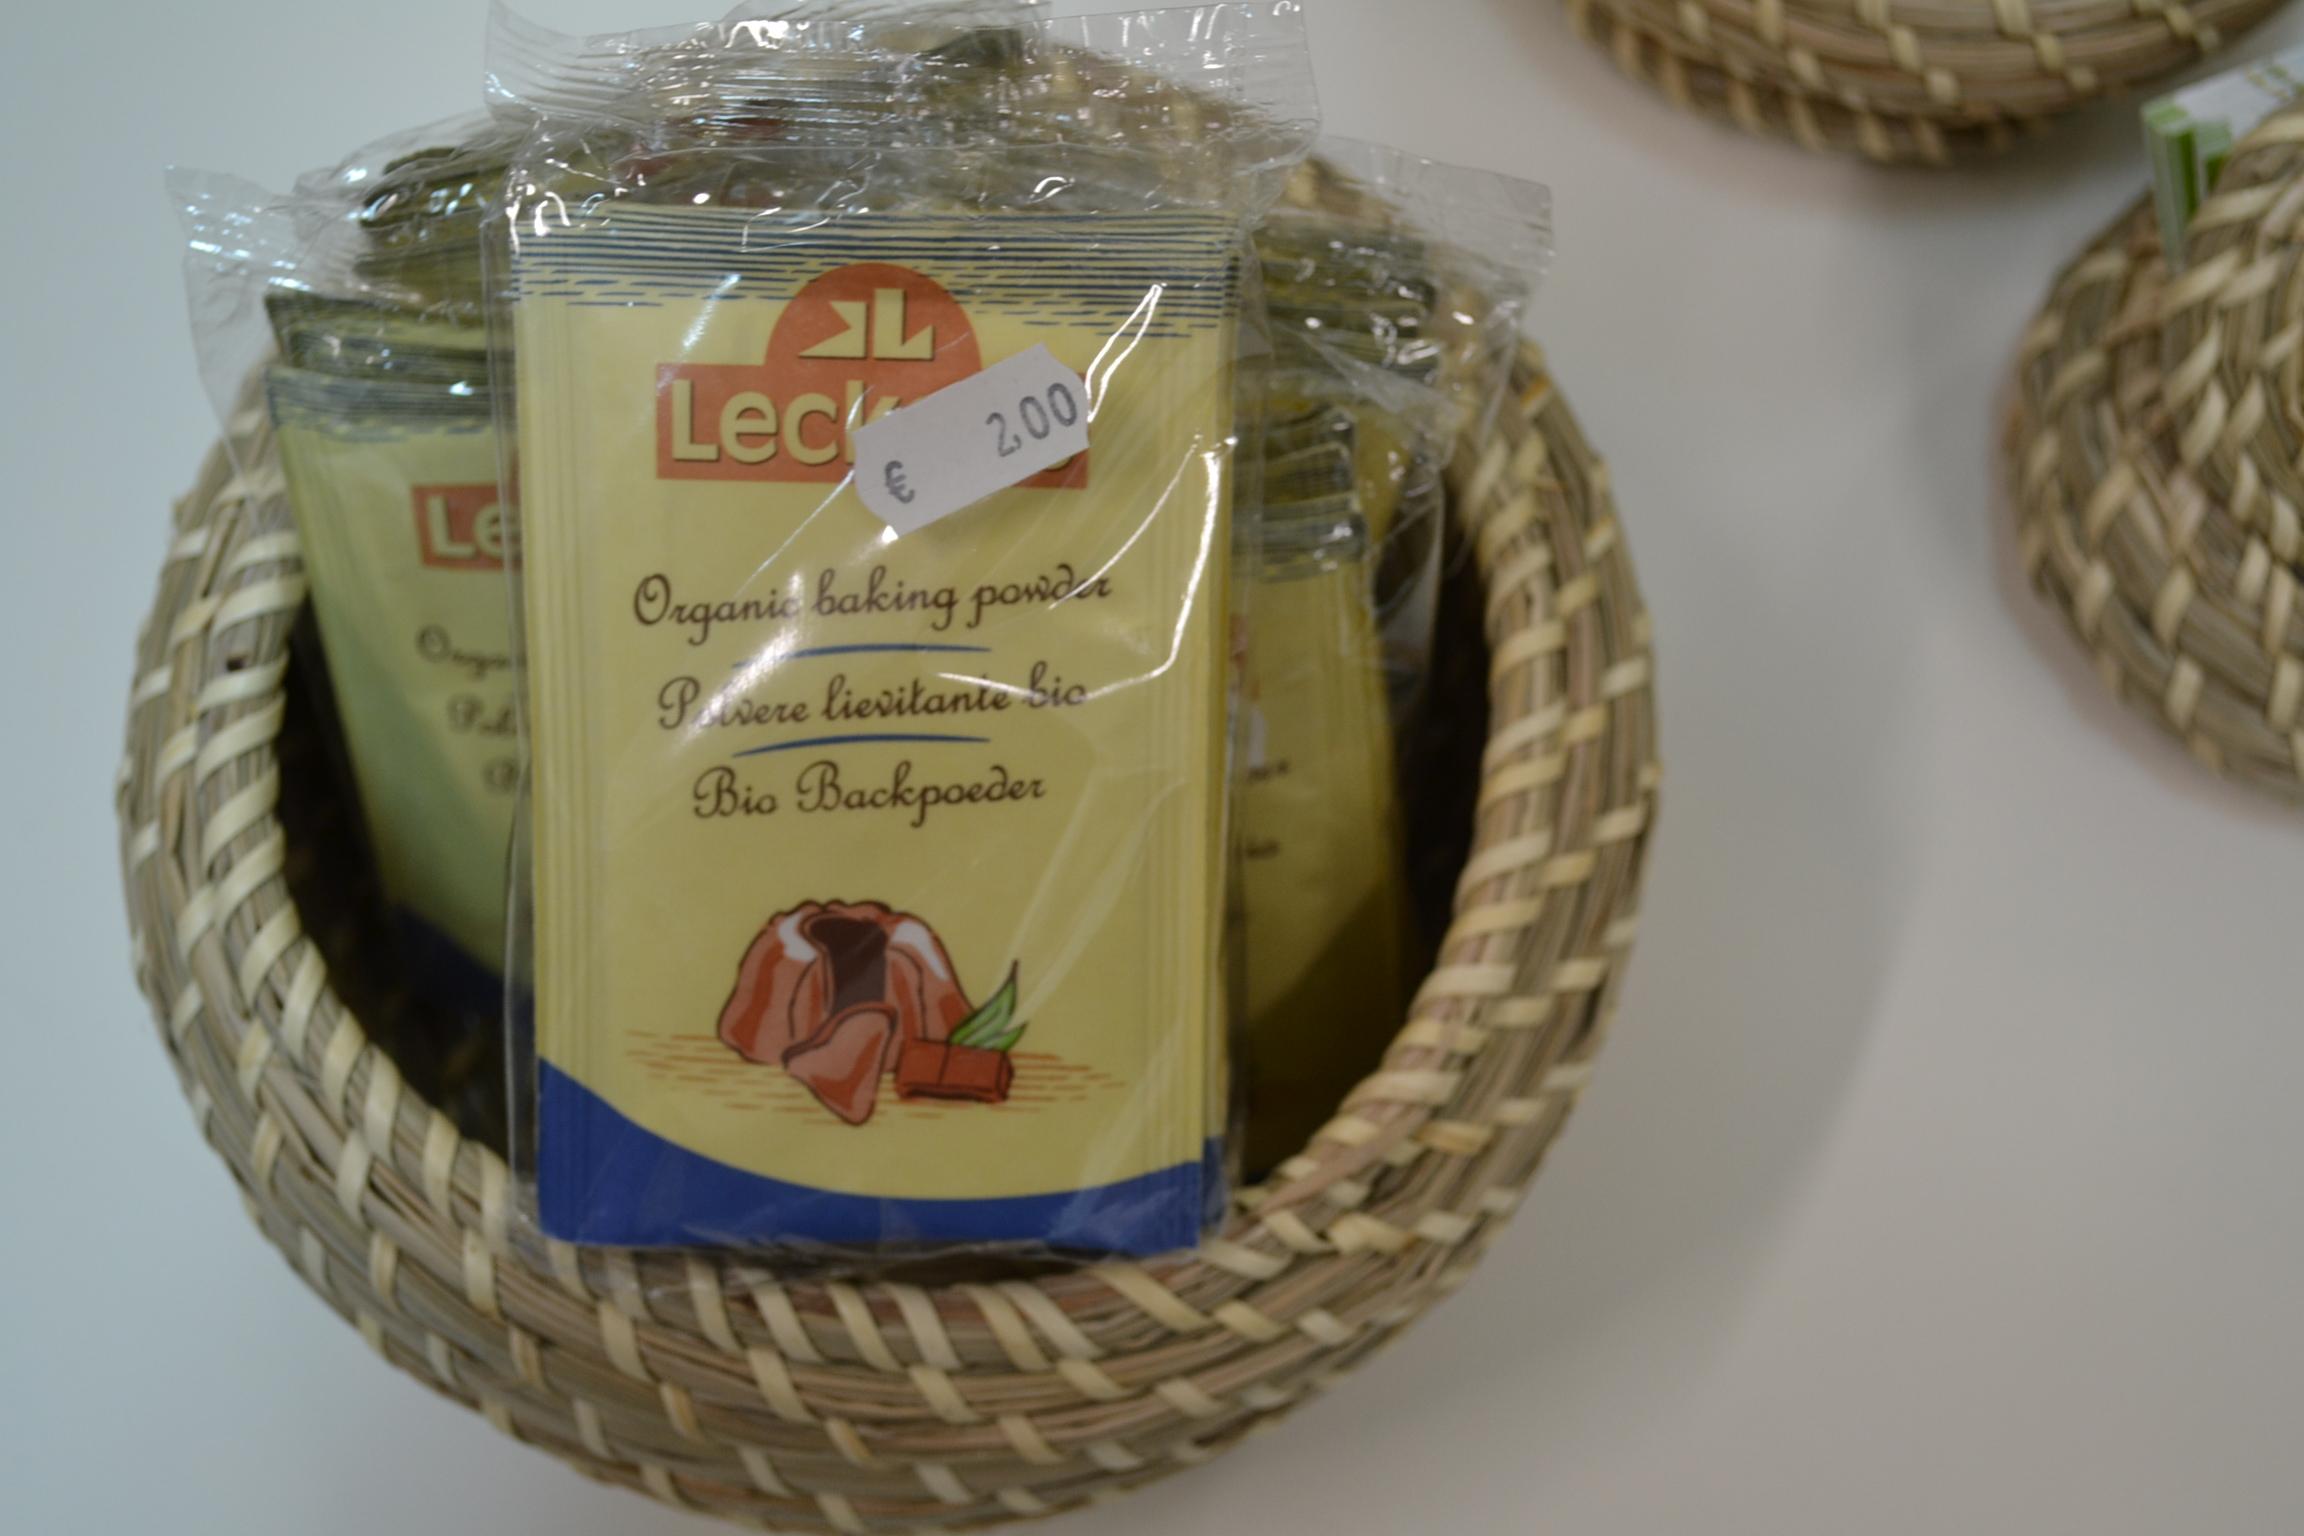 Cremor tartaro – Lievito biologico € 2,00